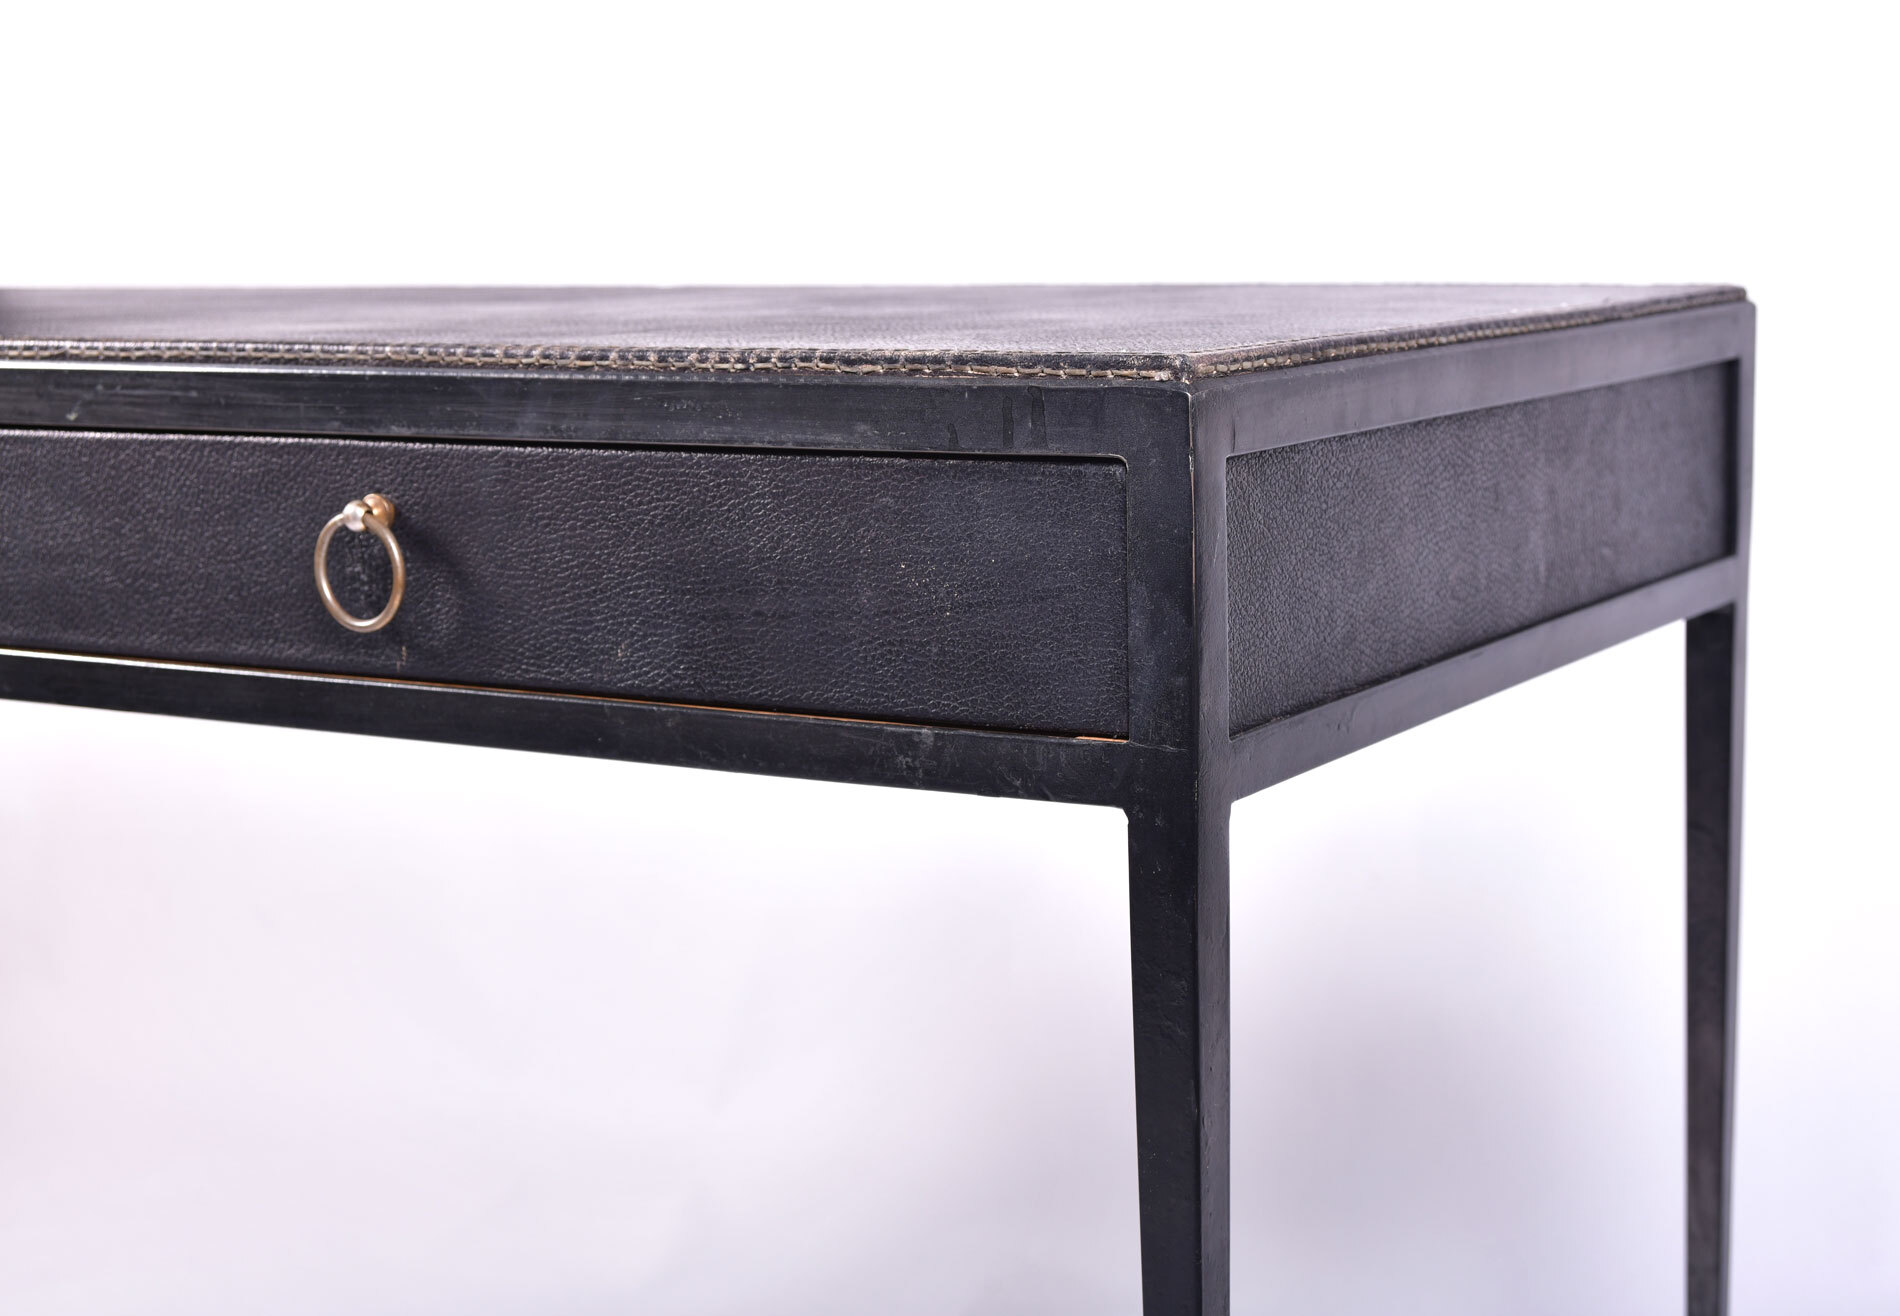 Jmf Leather Desk 07